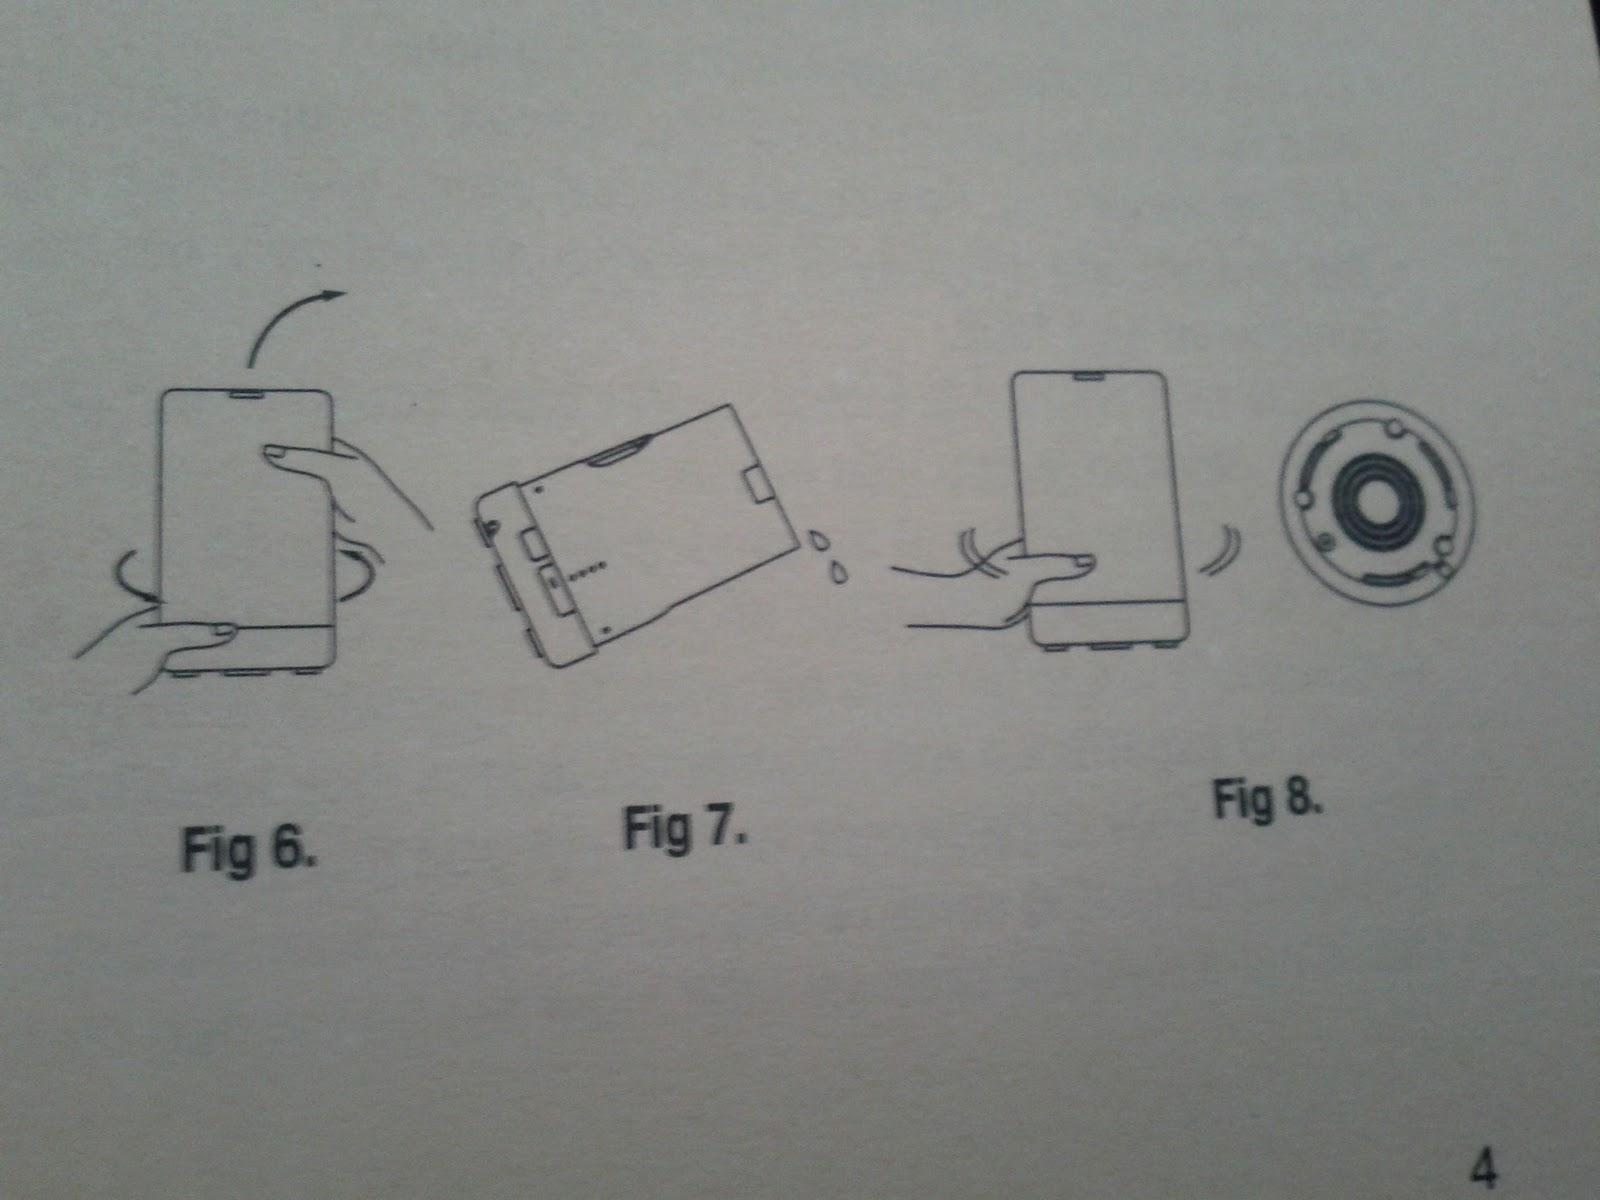 muji aroma diffuser instructions